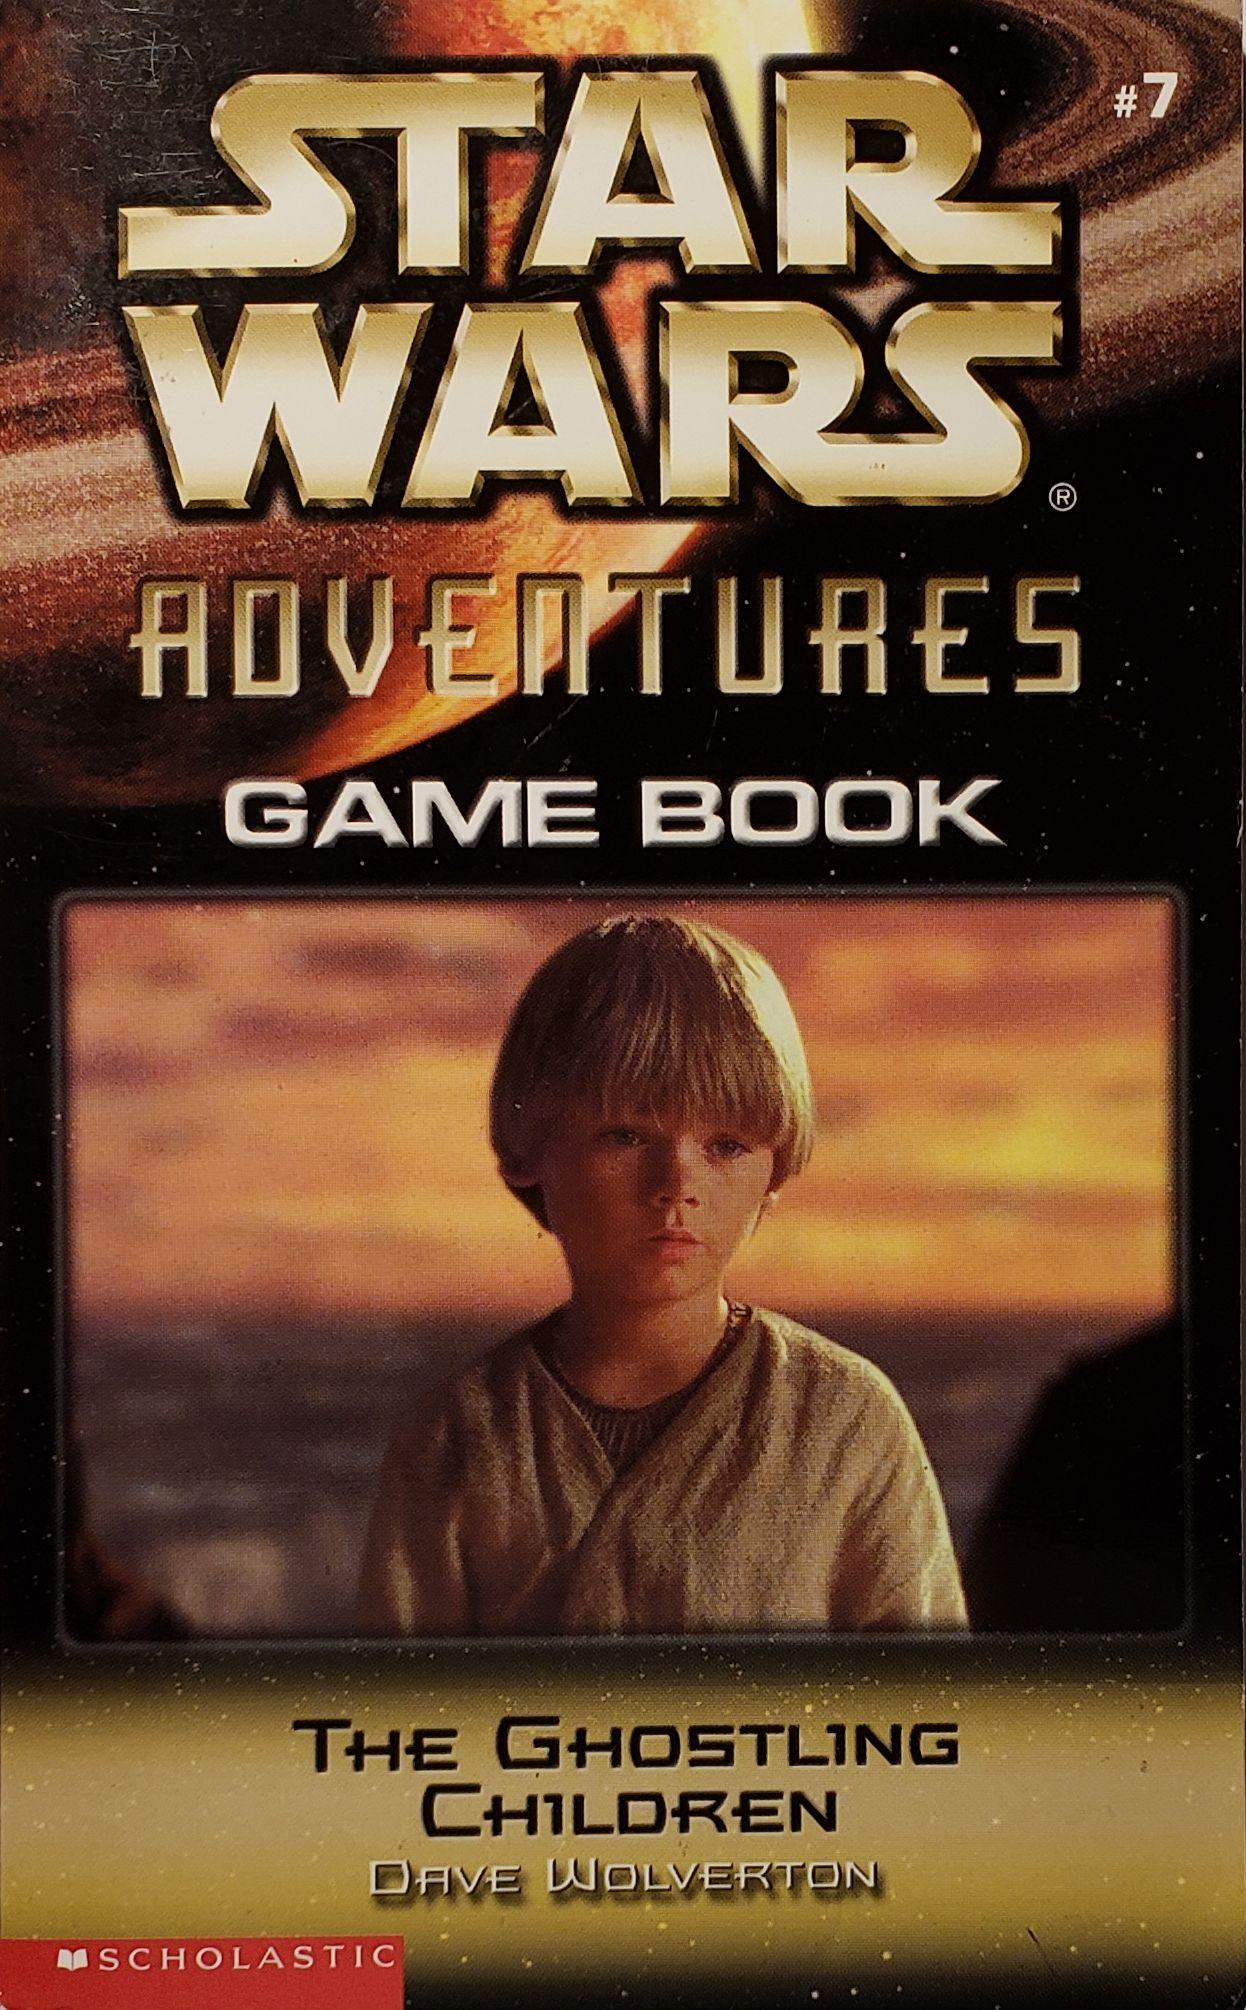 Star Wars Adventures Game Book (Episode II): #7 The Ghostling Children